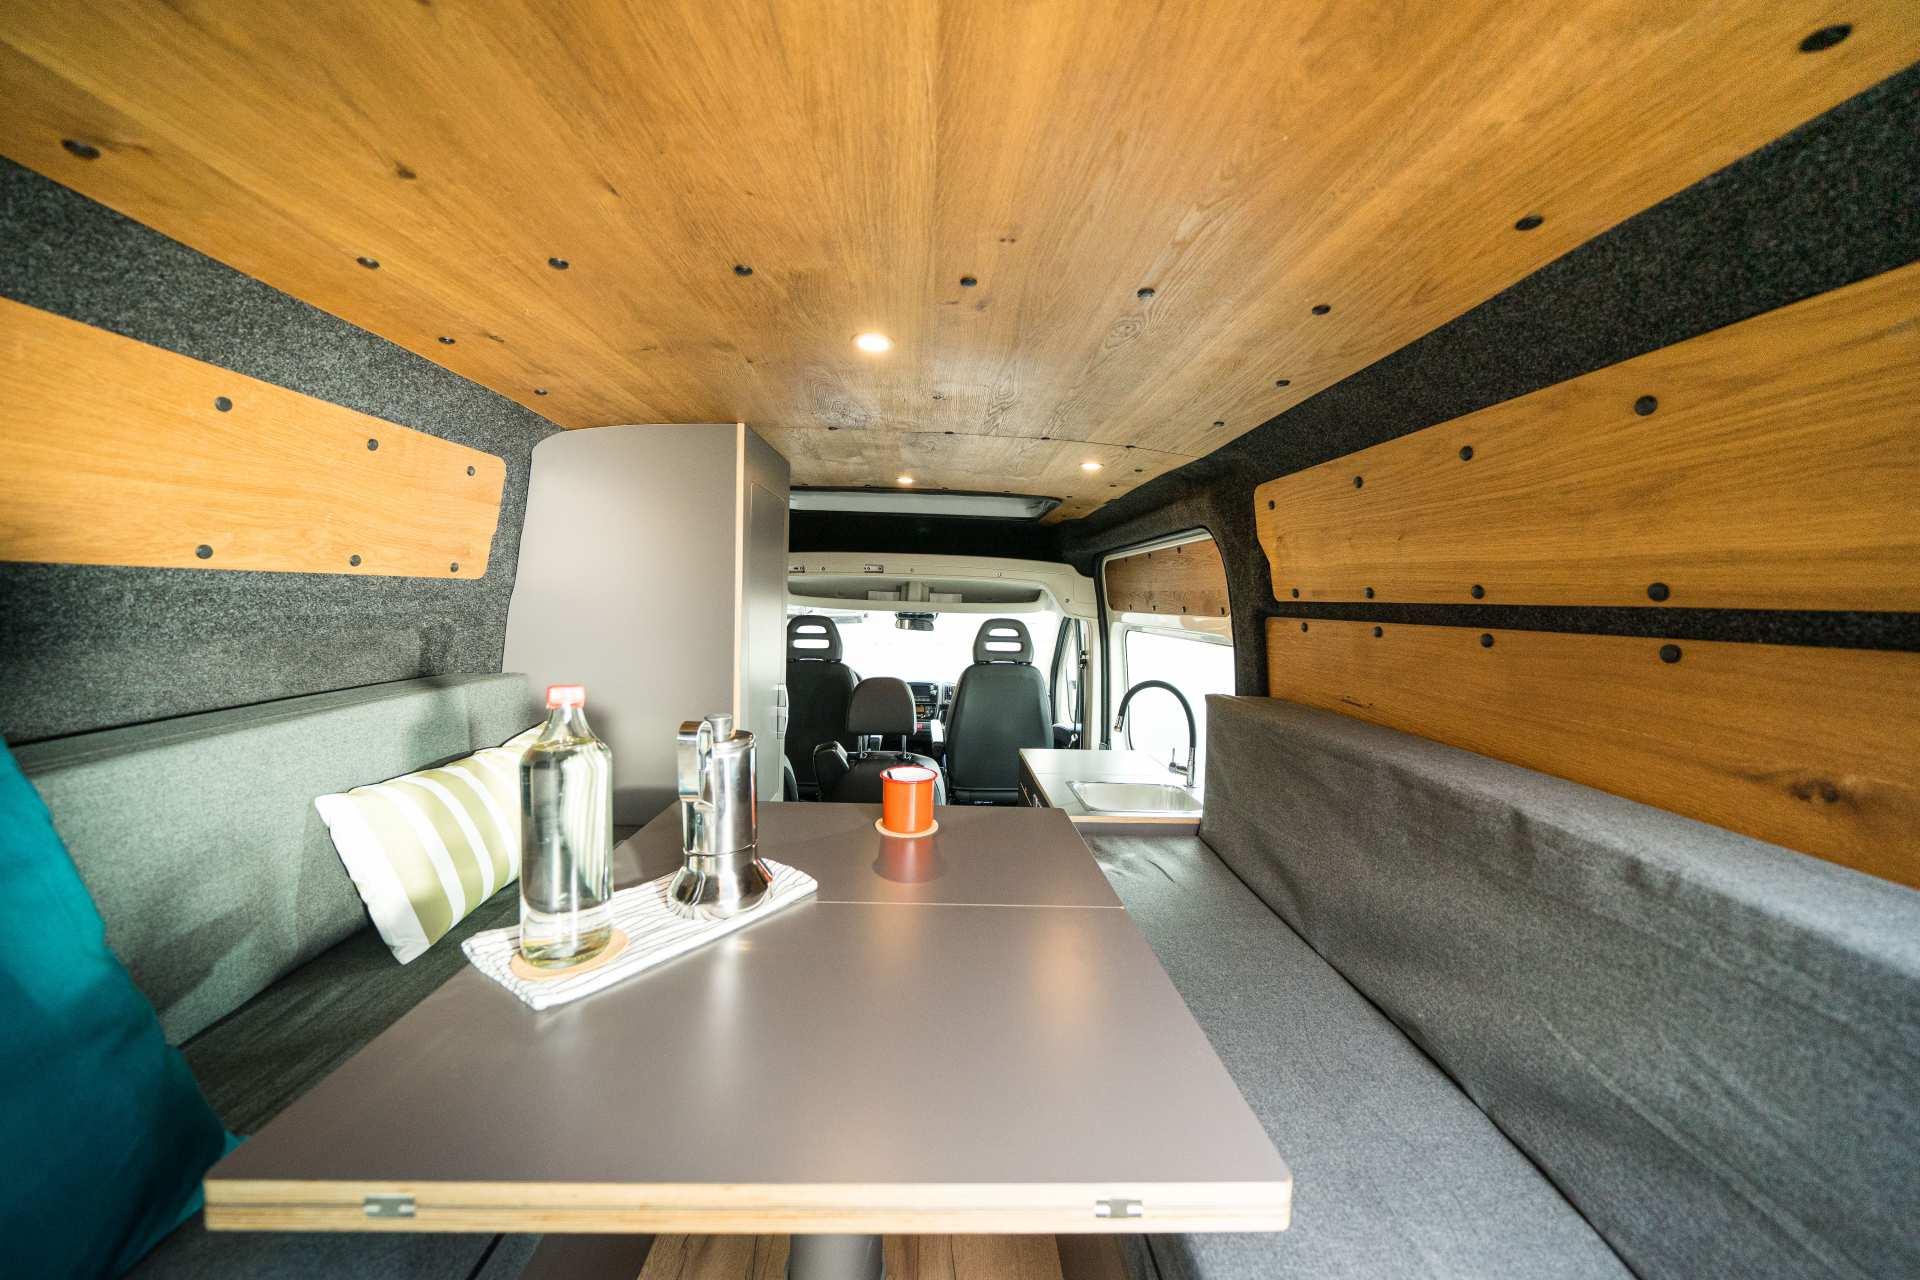 Individualausbau: Zwei-Raumwohnung Peugeot Boxer L2 H2 - 15